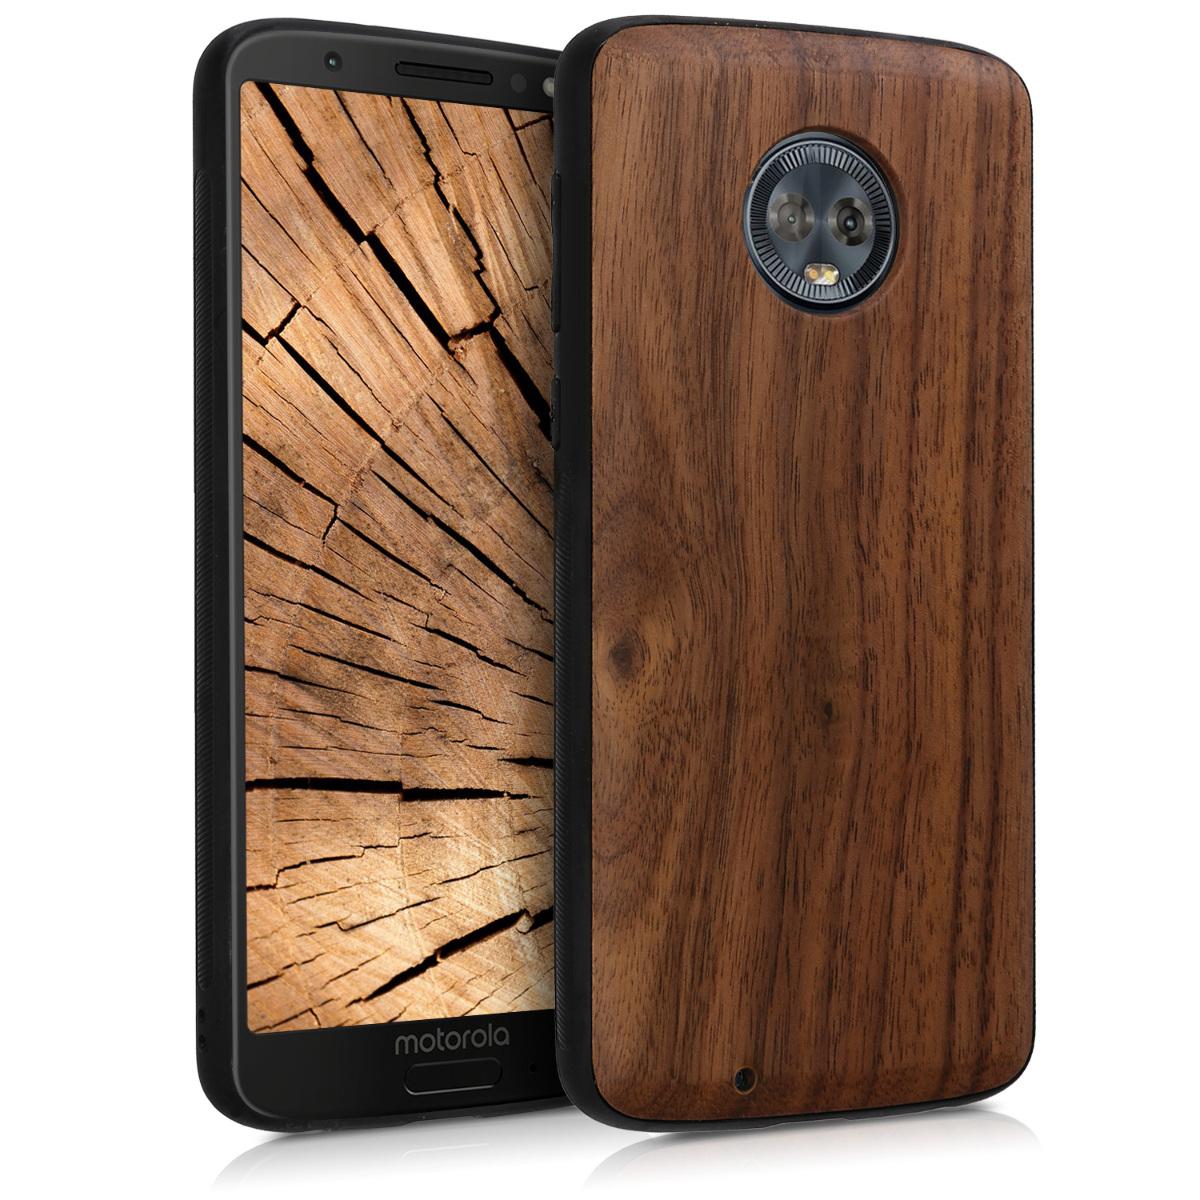 KW Σκληρή Ξύλινη Θήκη Motorola Moto G6 - Dark Brown (45288.18)